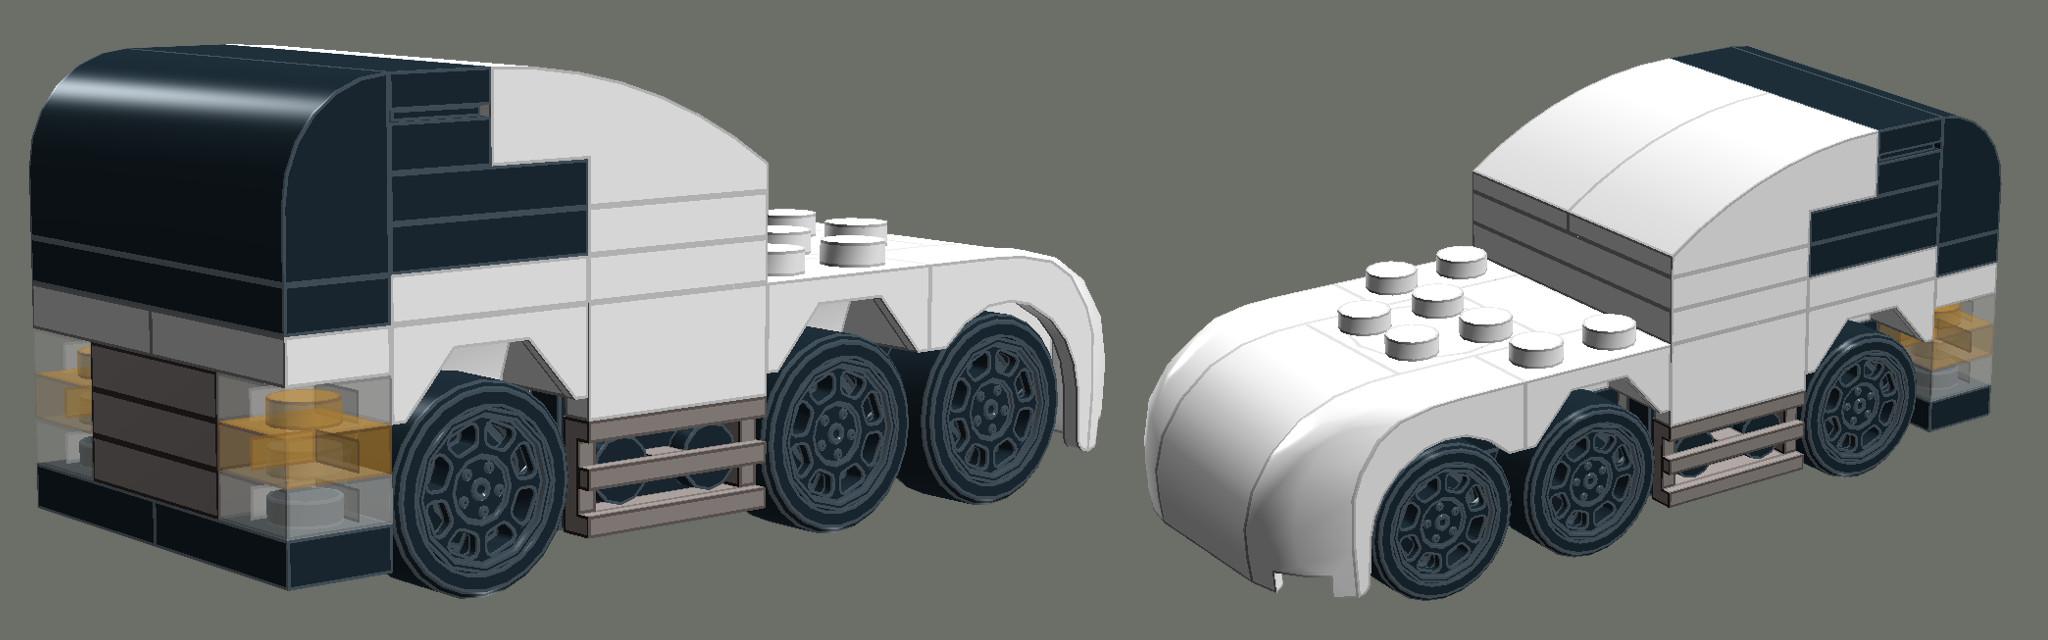 LEGO Concept Truck V1